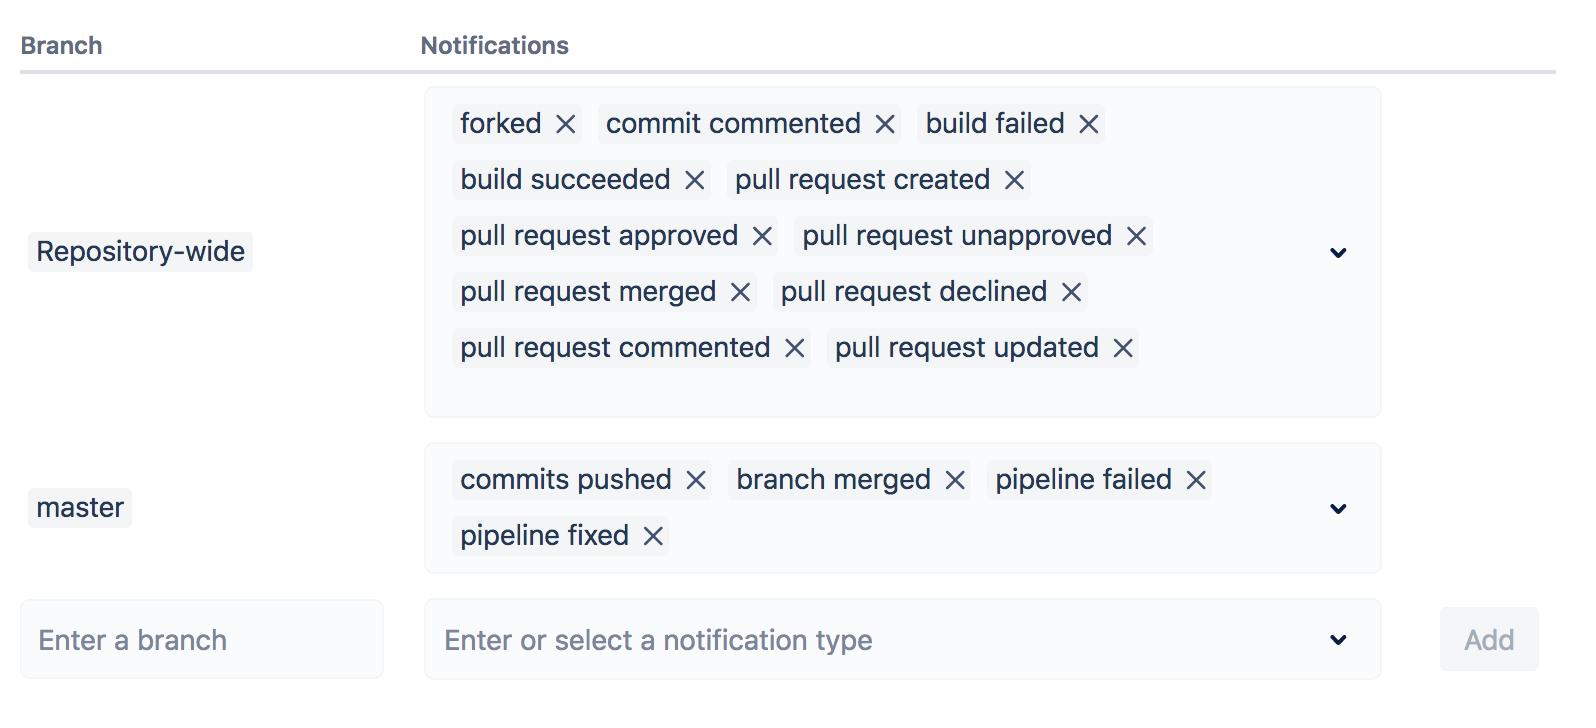 Image of default notifcation setting